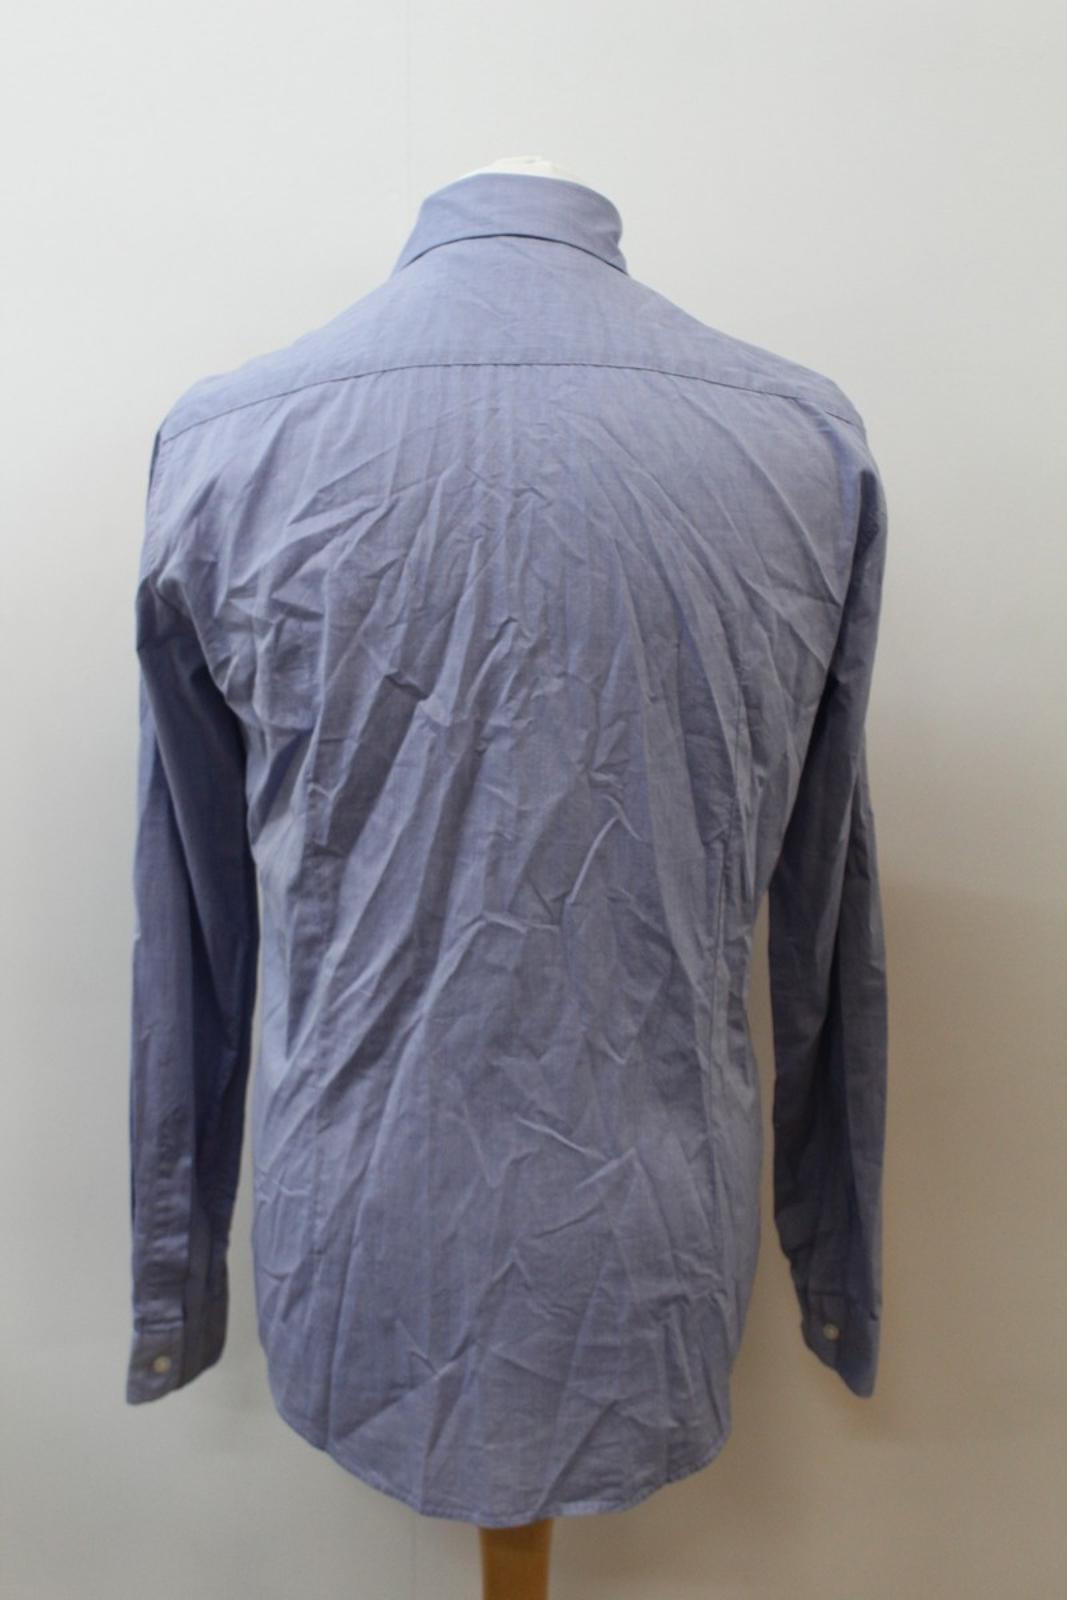 Boss-Orange-men-Azul-Algodon-Manga-Larga-Cuello-Con-Cuello-Informal-Camisa-Talla-M miniatura 5